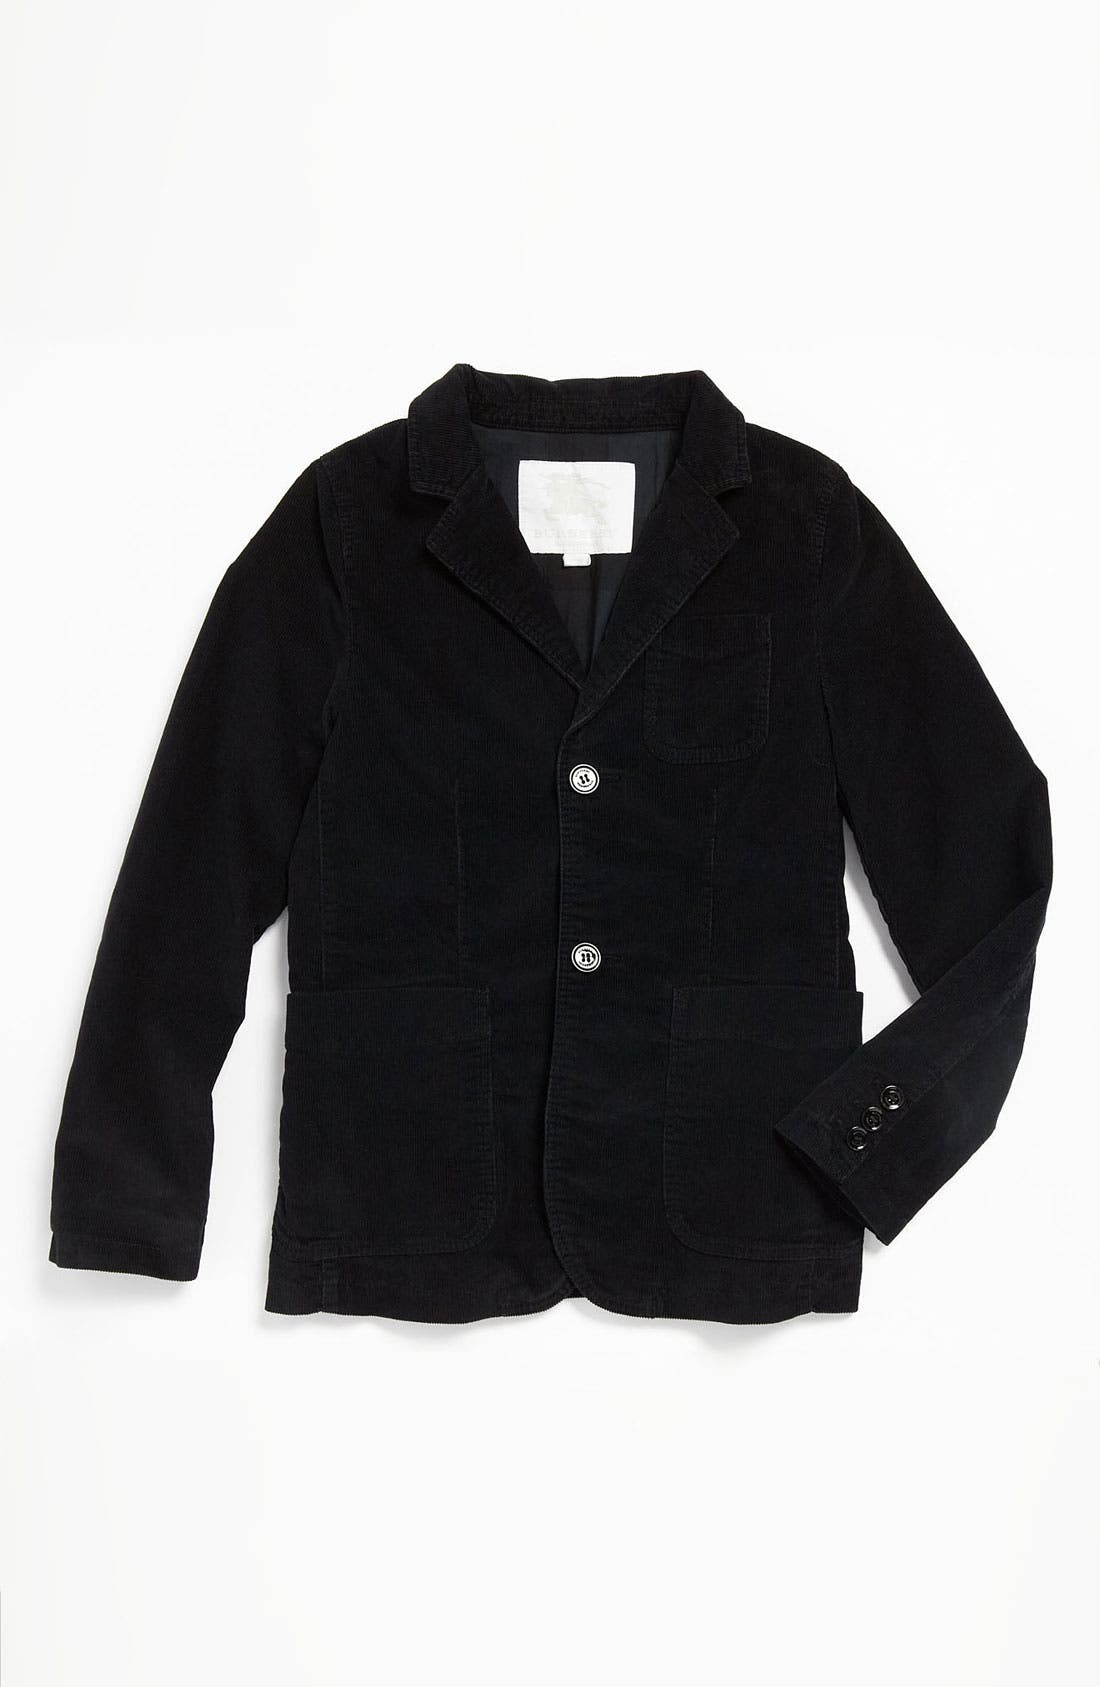 Alternate Image 1 Selected - Burberry Tailored Corduroy Jacket (Big Boys)